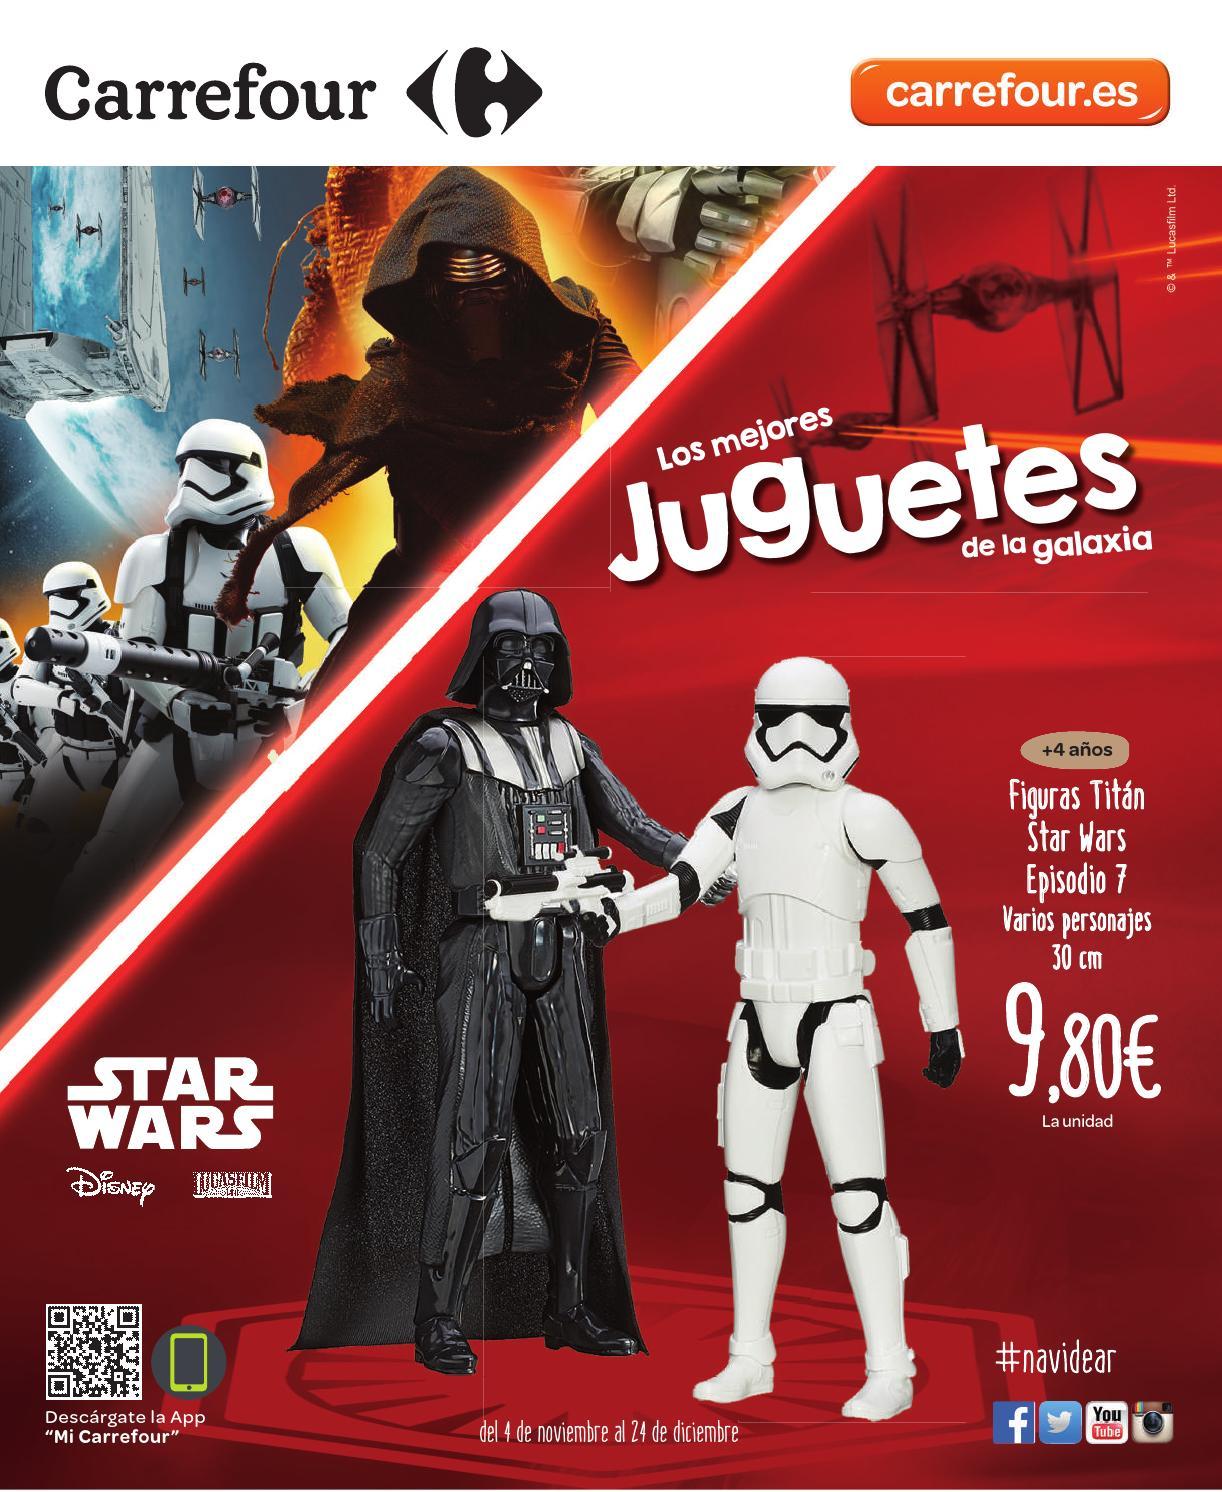 Catalogo juguetes carrefour 2015 by carrefour online issuu Cocina juguete carrefour